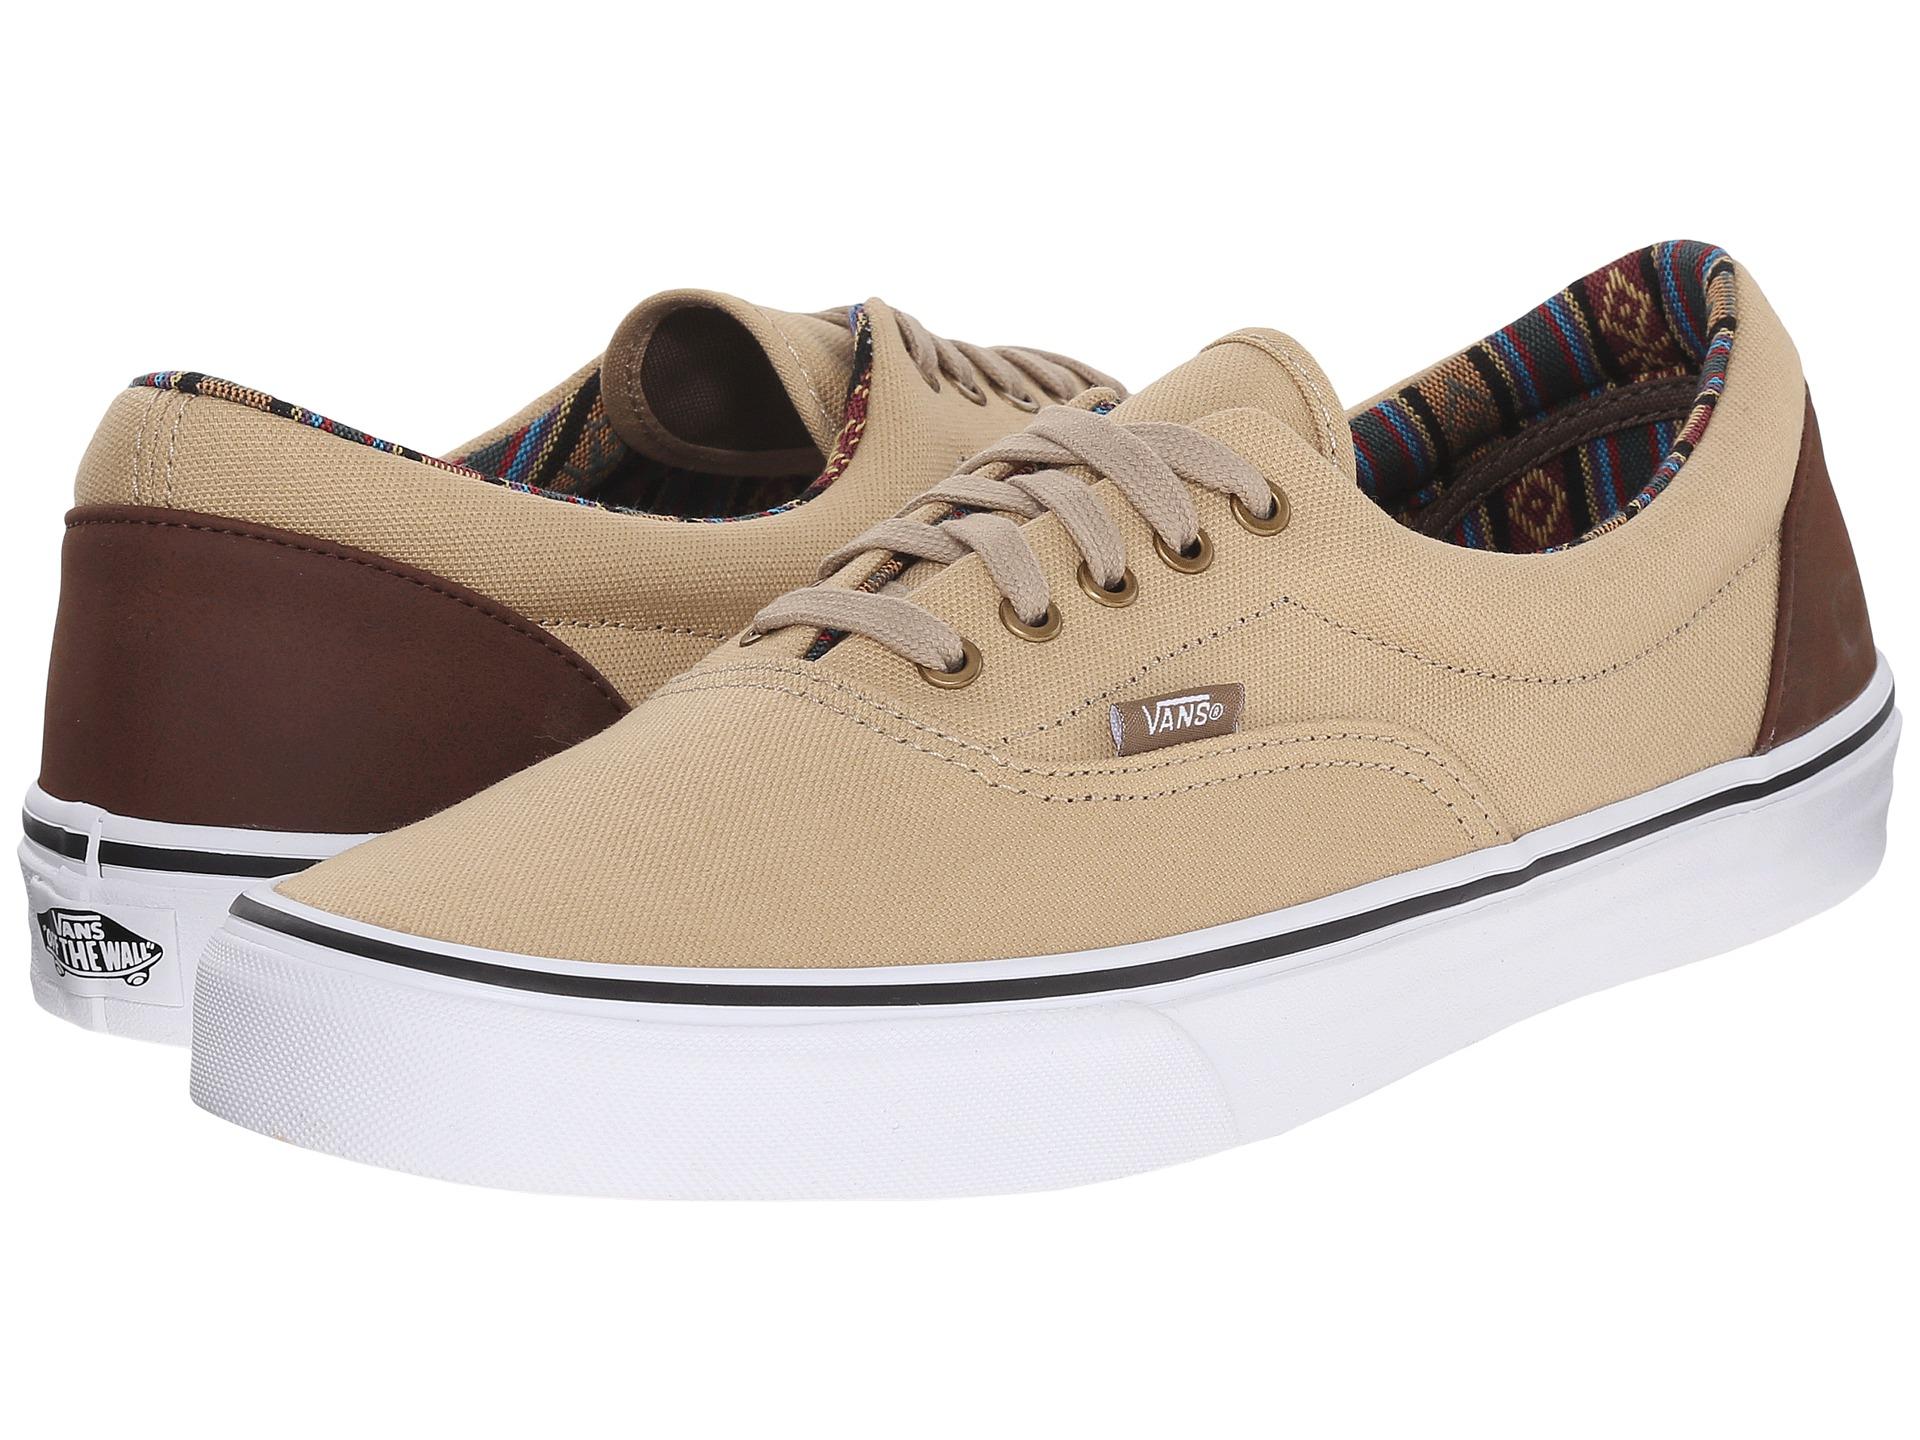 Skate shoes jakarta - Gallery